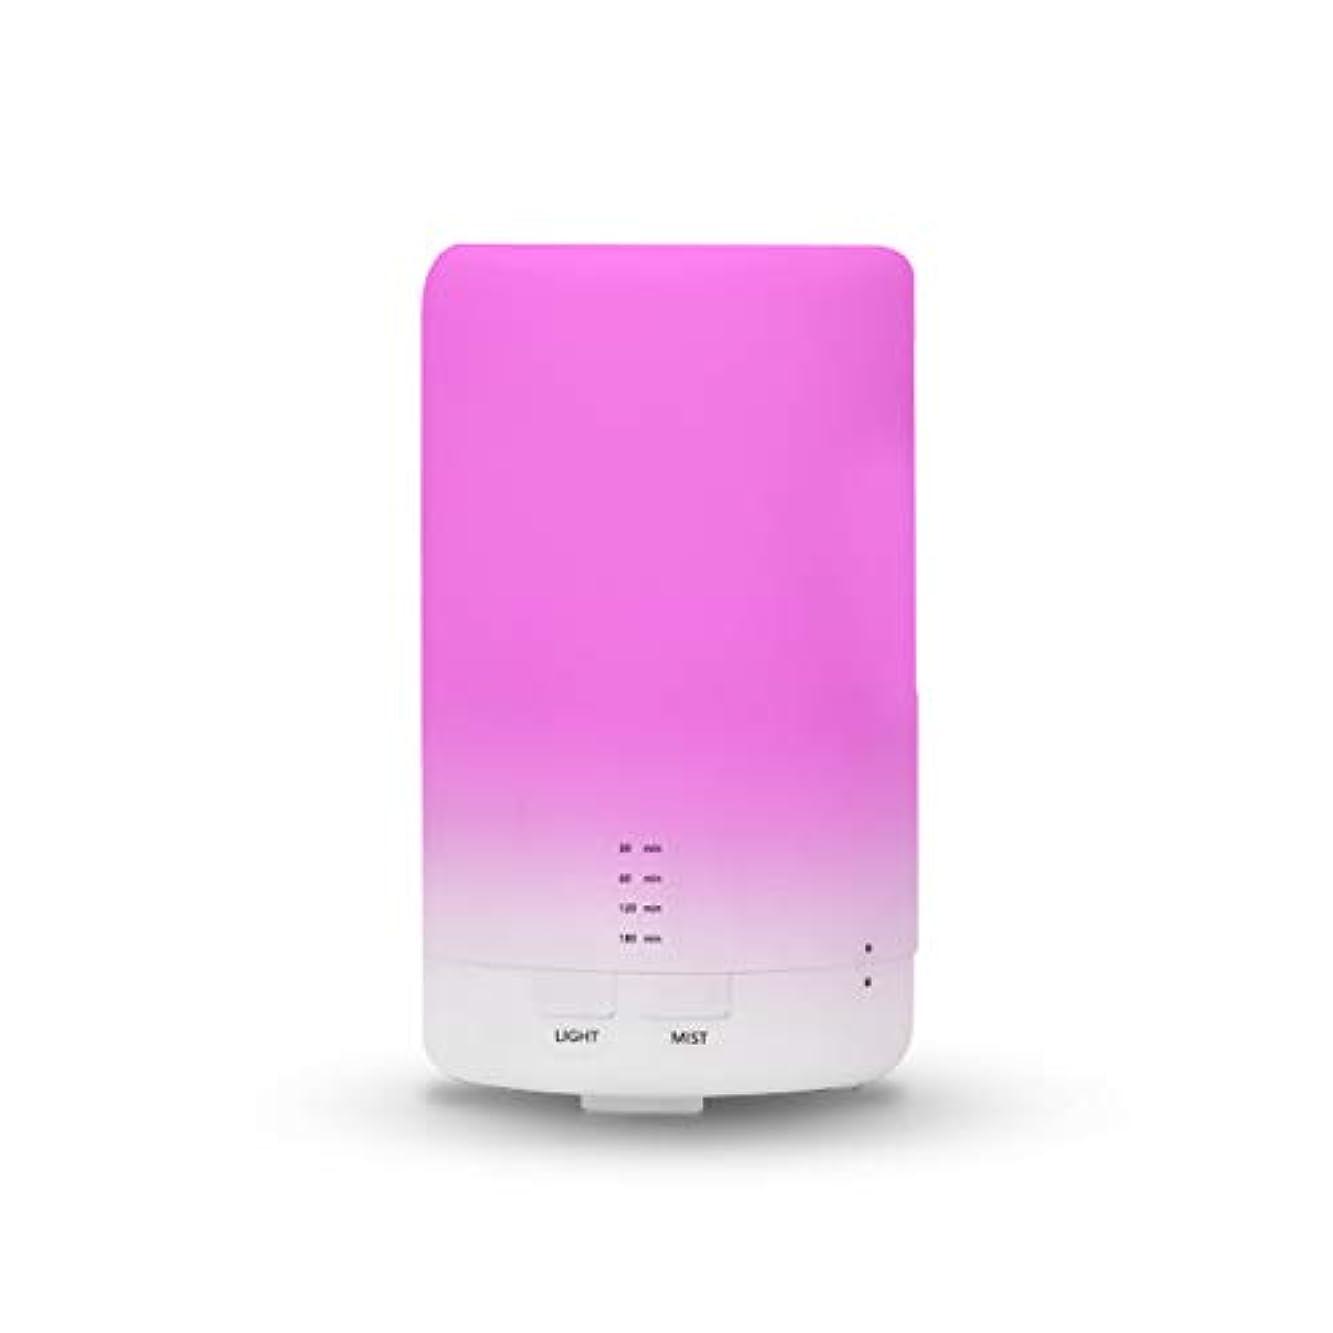 Fashion·LIFE アロマディフューザー 超音波 アロマ加湿器 空気清浄機 七色変換LEDライト タイマー機能 空焚き防止 部屋 会社 ヨガなど用